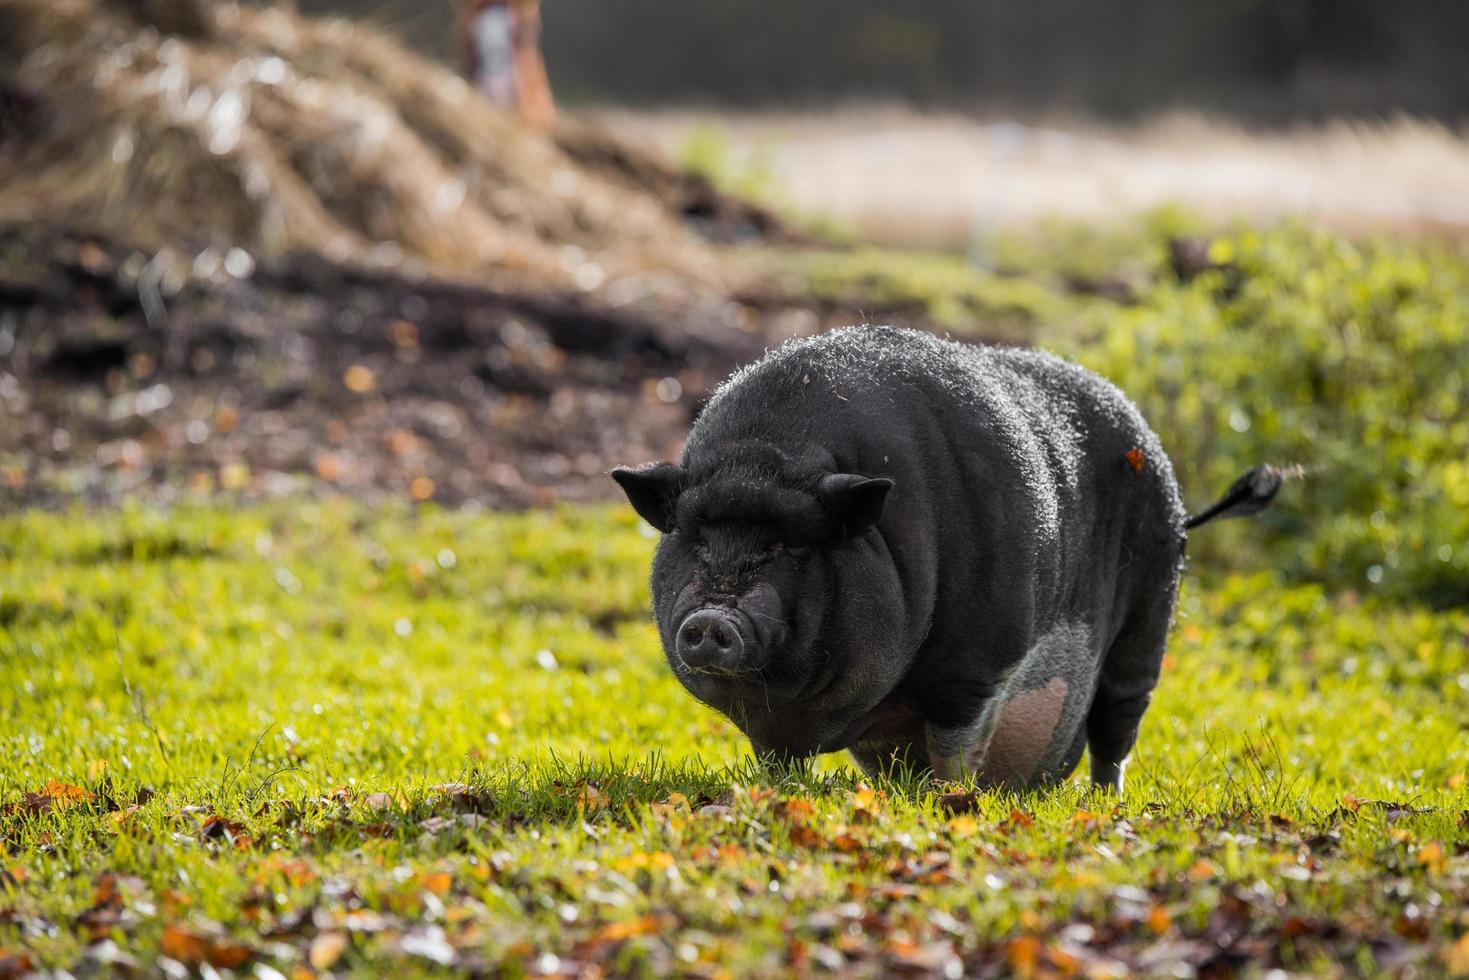 porco preto na grama verde foto